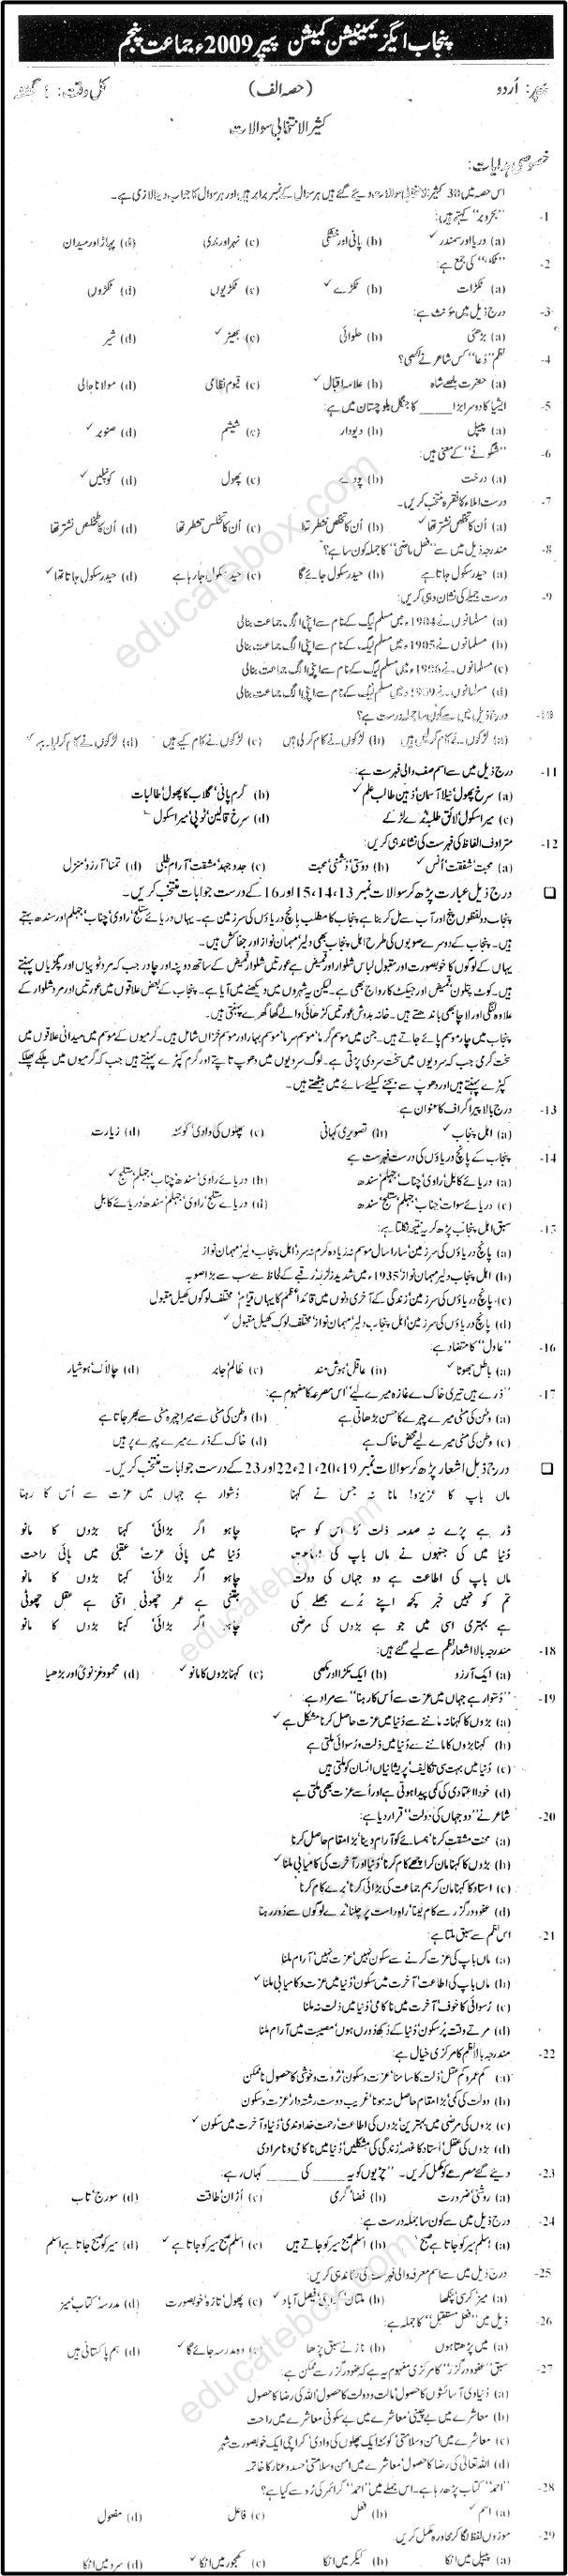 Past Paper - Class 5 Urdu Punjab Education Commission 2009 Solved Paper - Objective Type